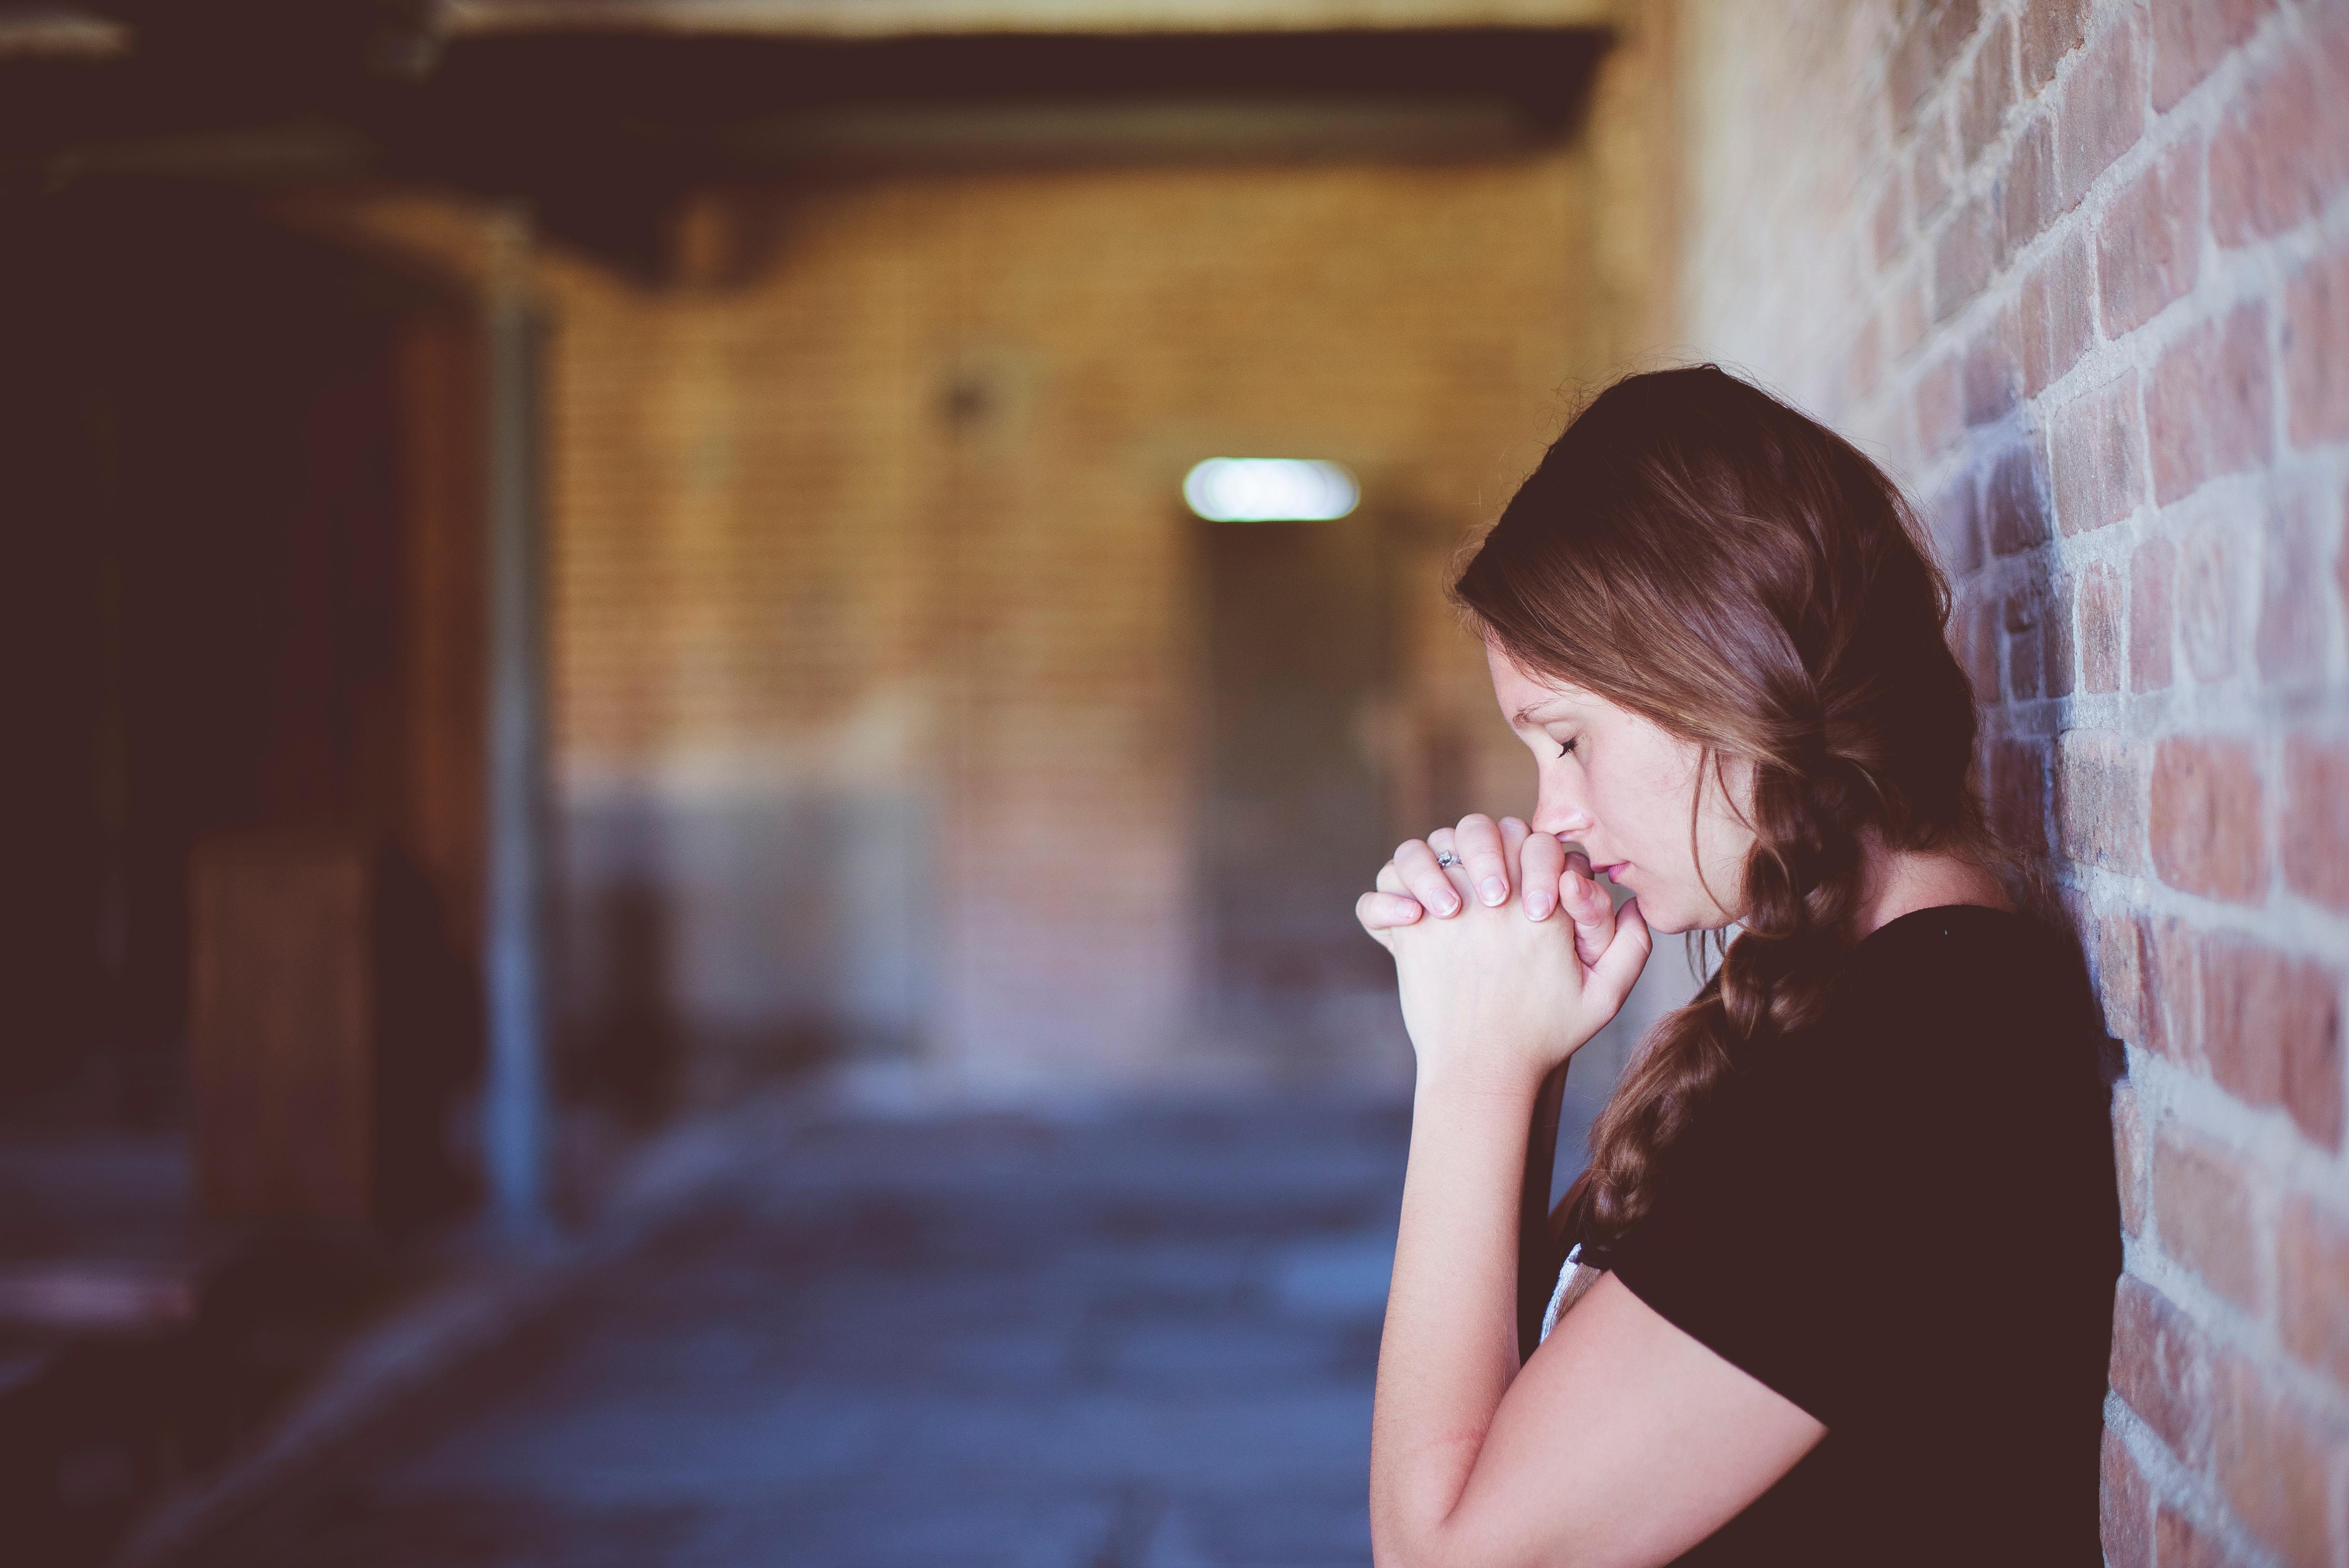 catholic-pray-to-saints